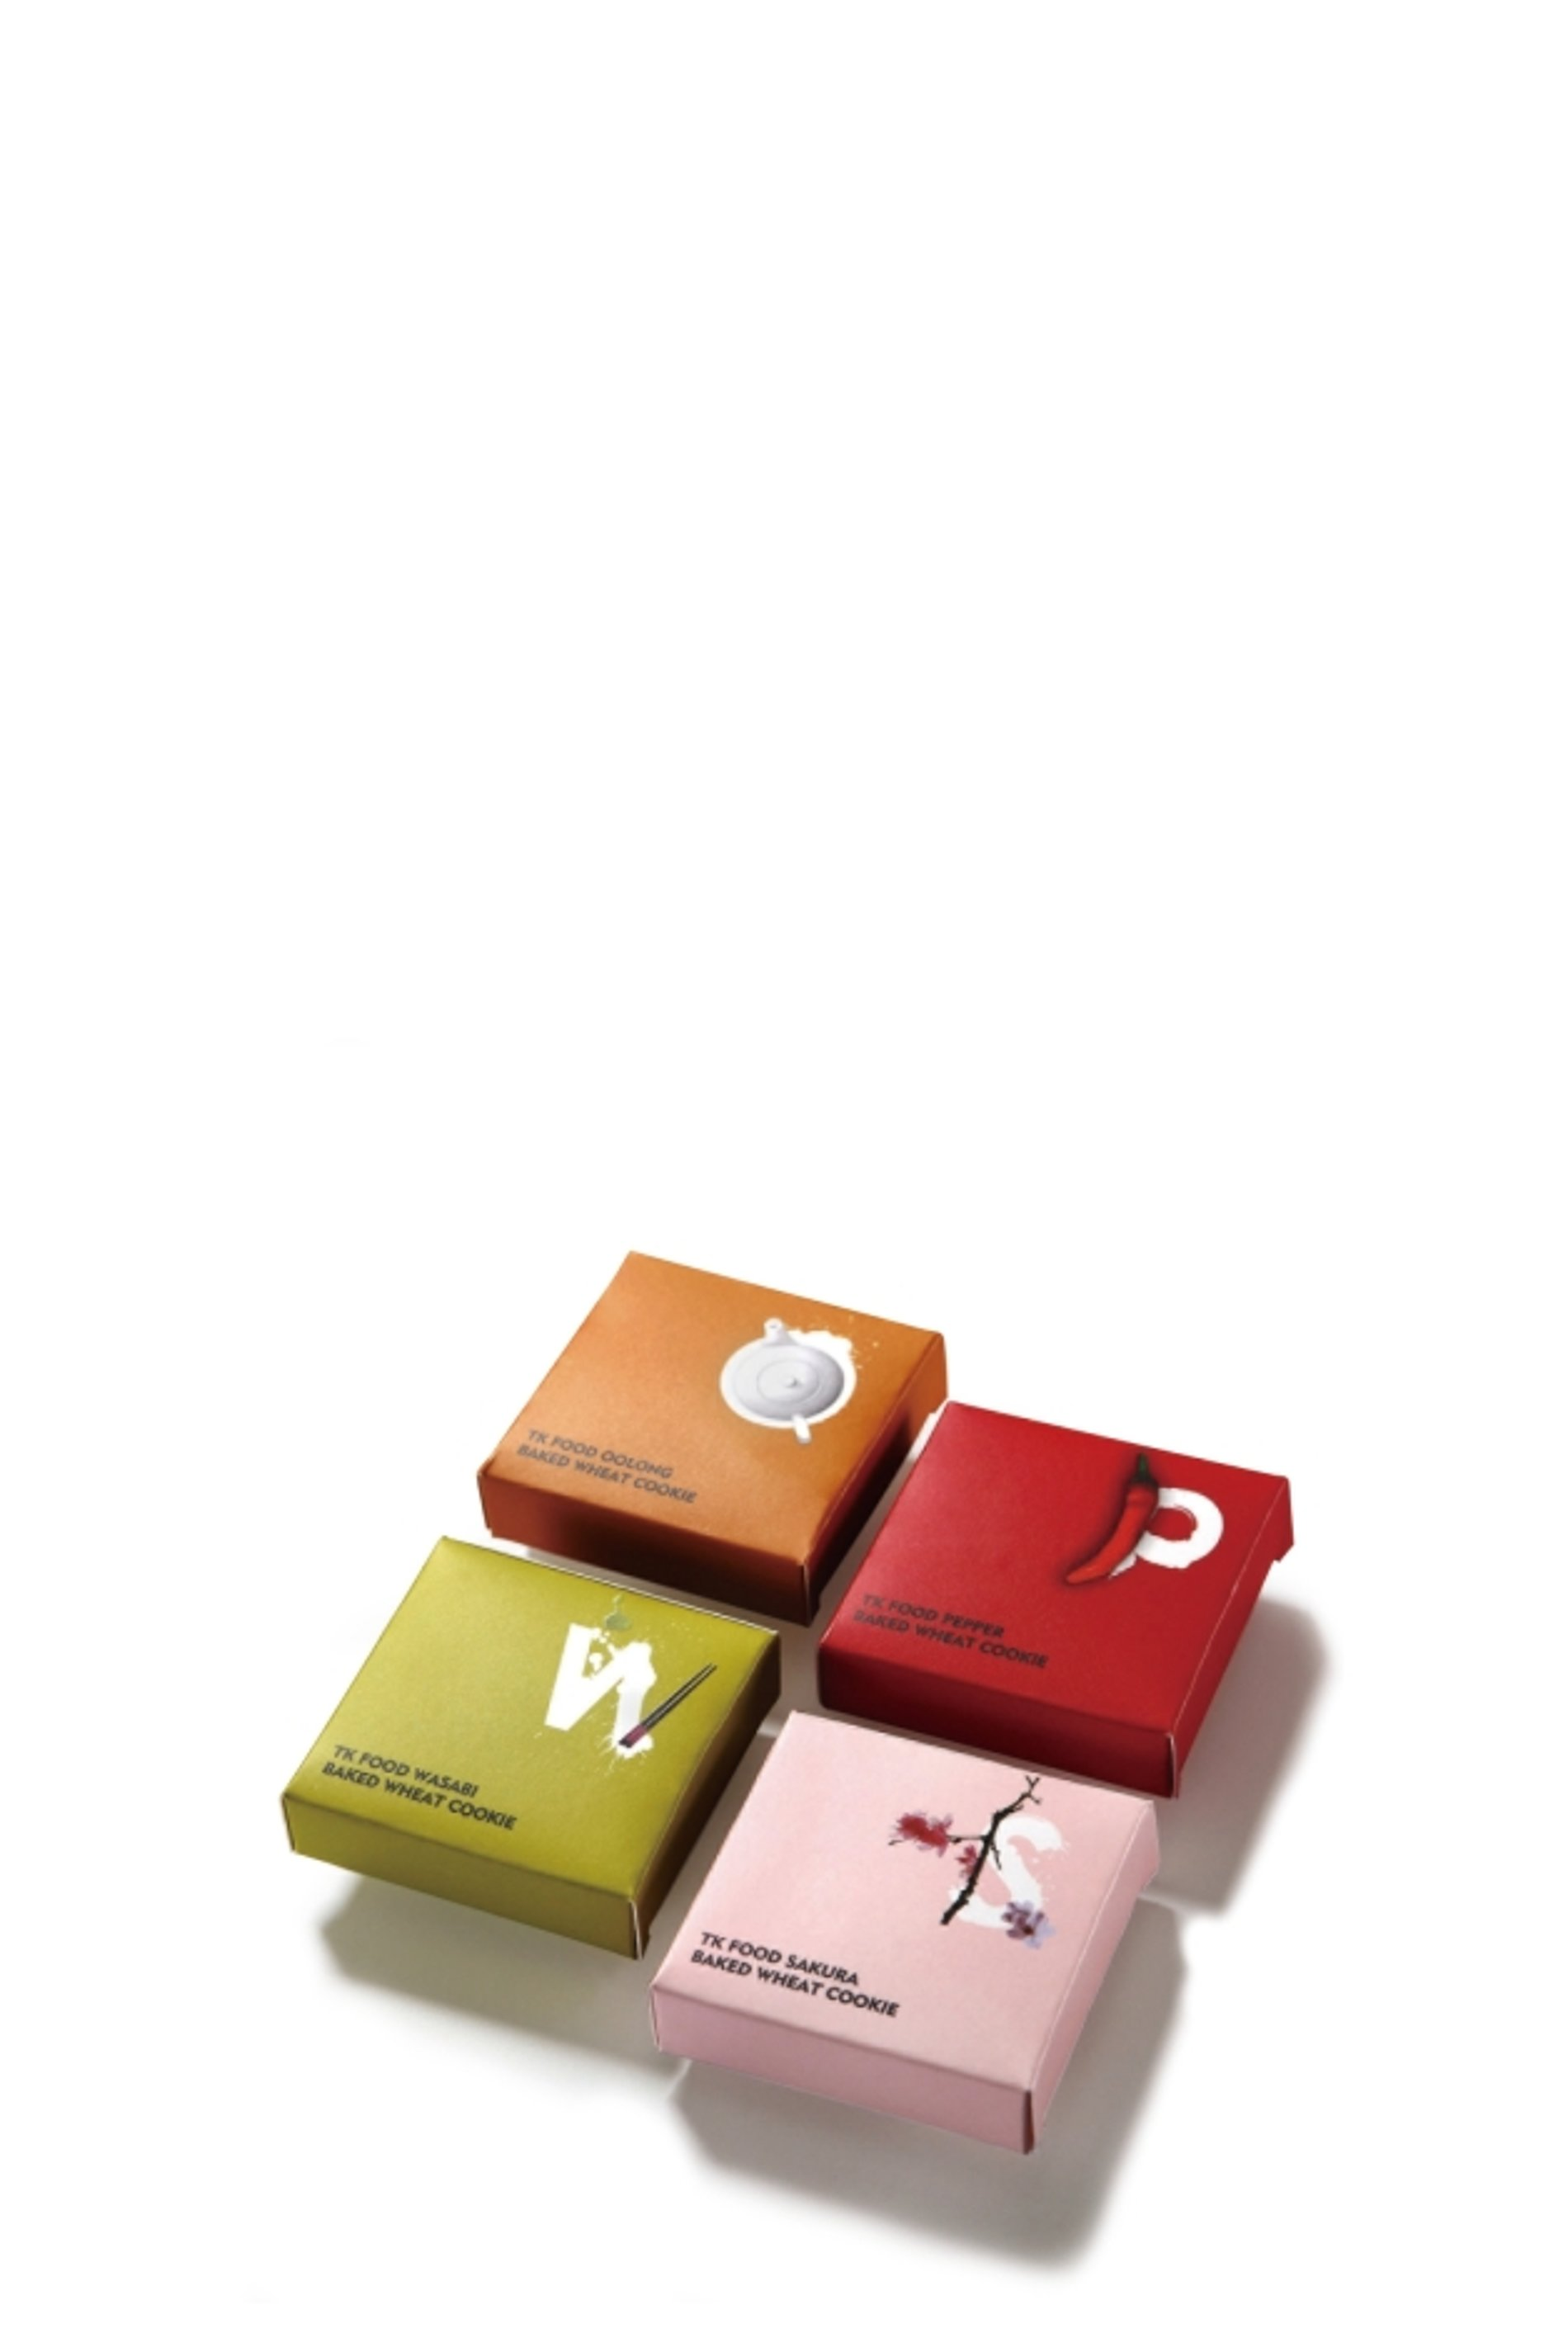 TK FOOD Assorted Flavours   Red Dot Design Award